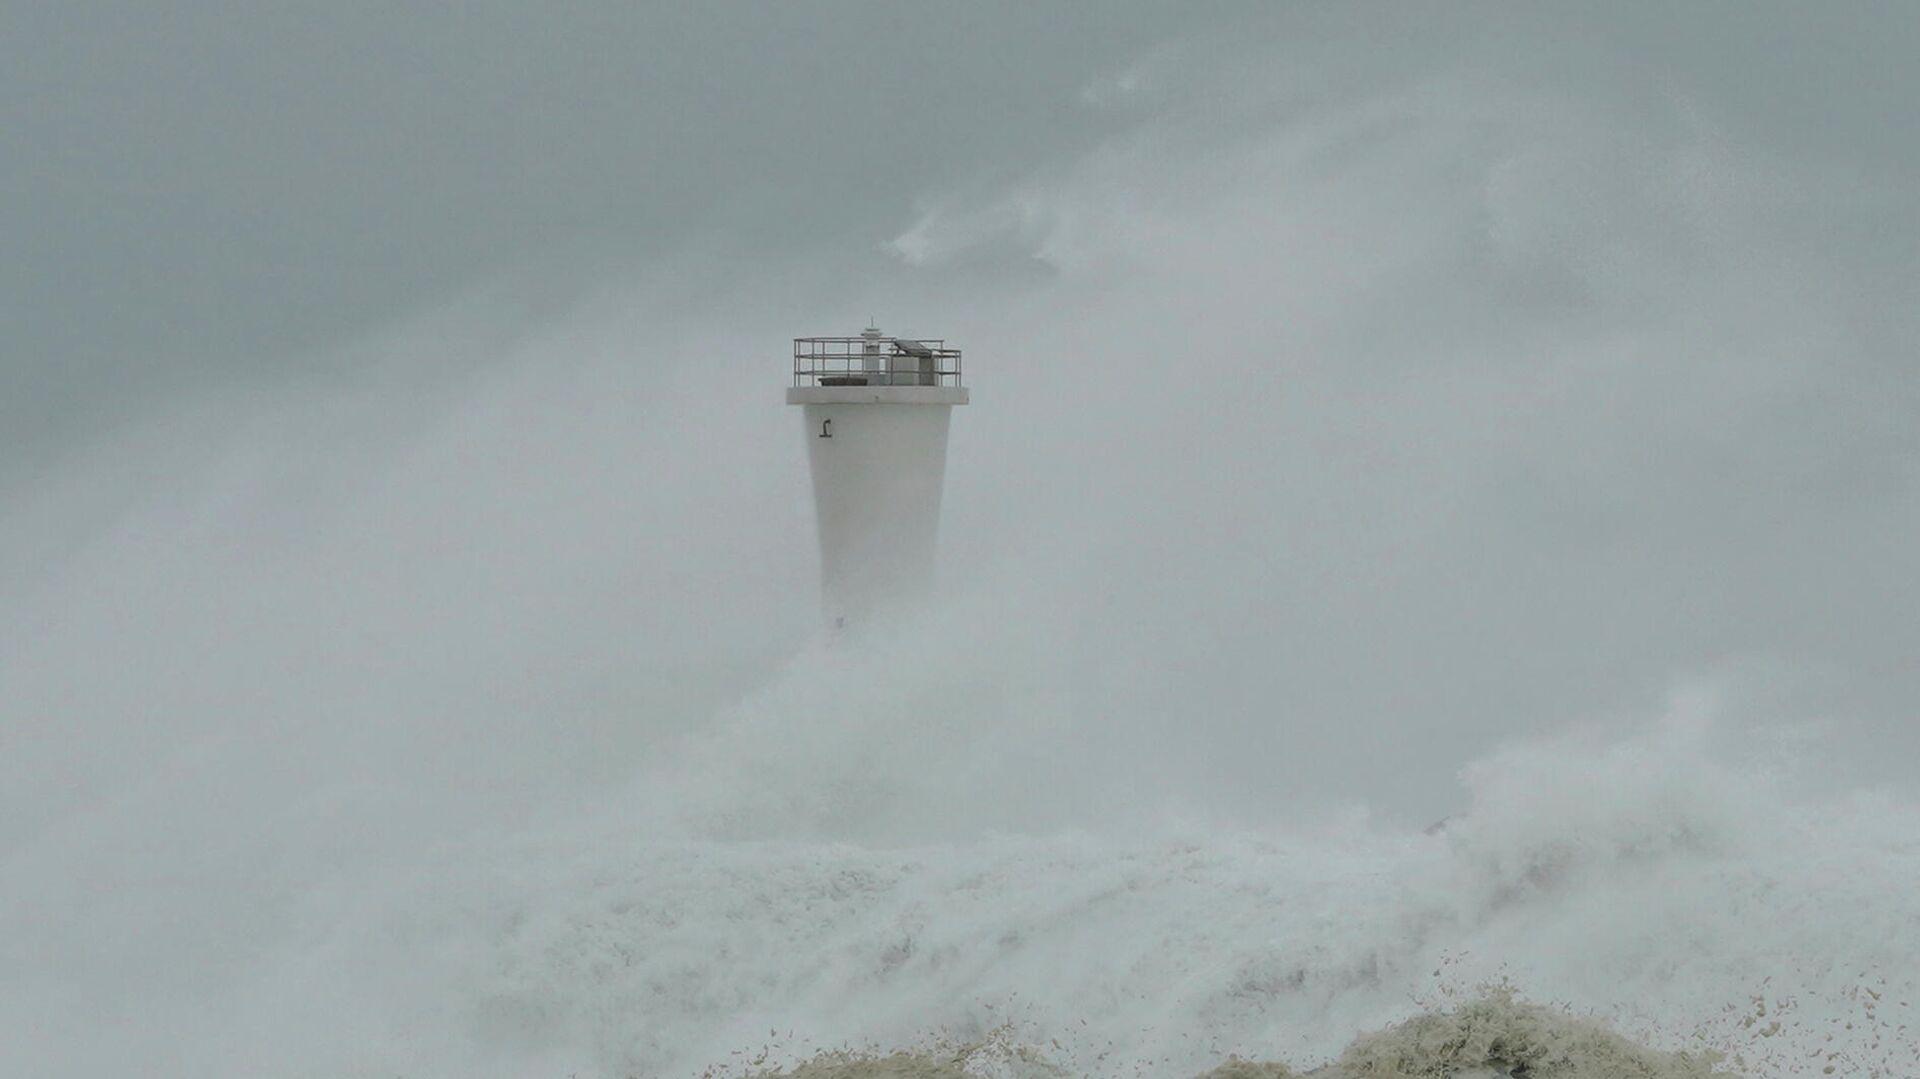 Тайфун Хагибис в Японии. 12 октября 2019 - РИА Новости, 1920, 04.09.2020